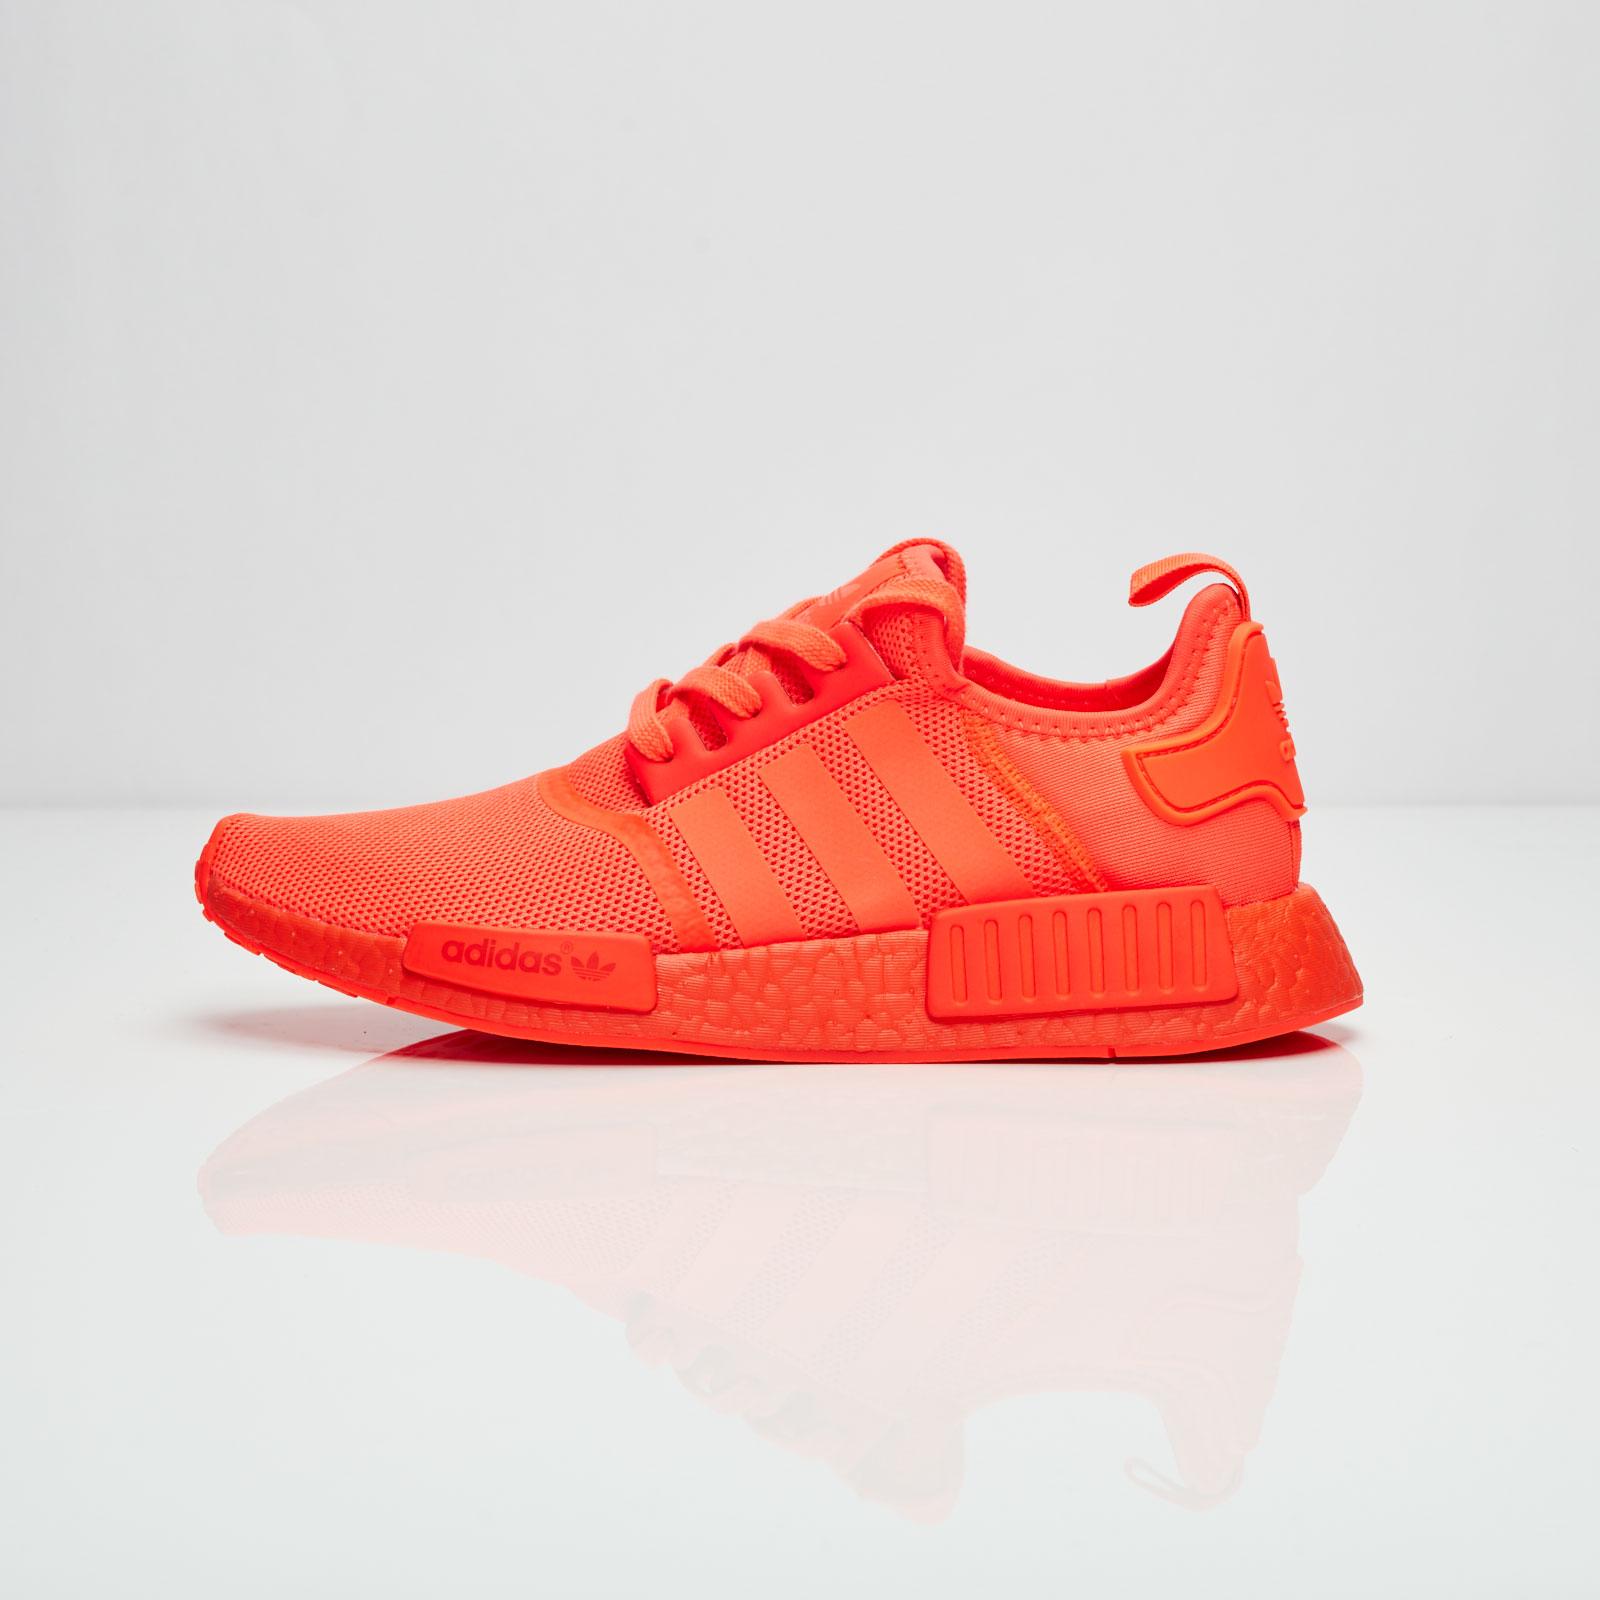 adidas nmd r1 s31507 sneakersnstuff scarpe & streetwear